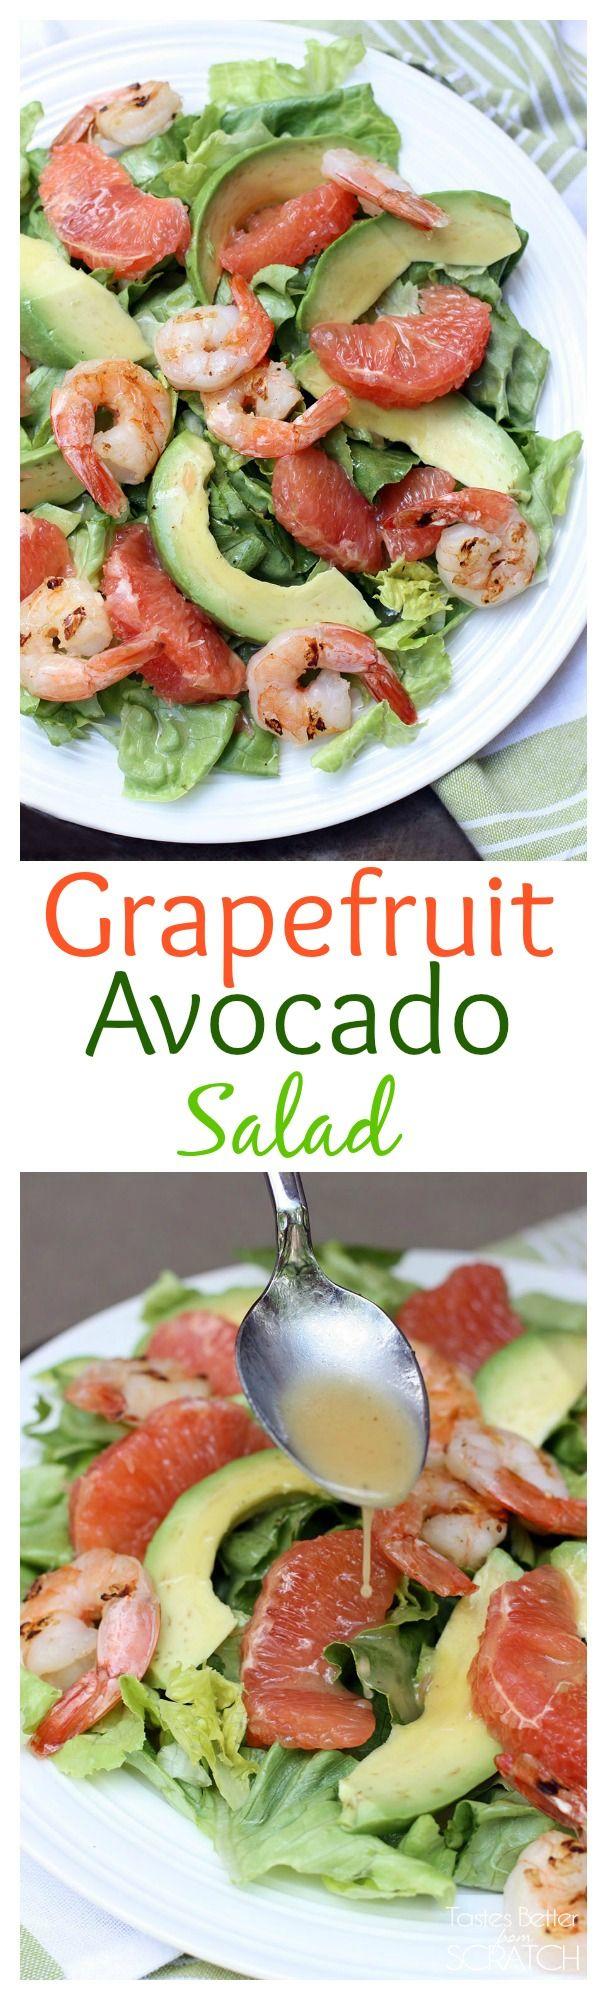 My favorite fresh and healthy salad! Grapefruit Avocado Salad with grilled shrimp on MyRecipeMagic.om